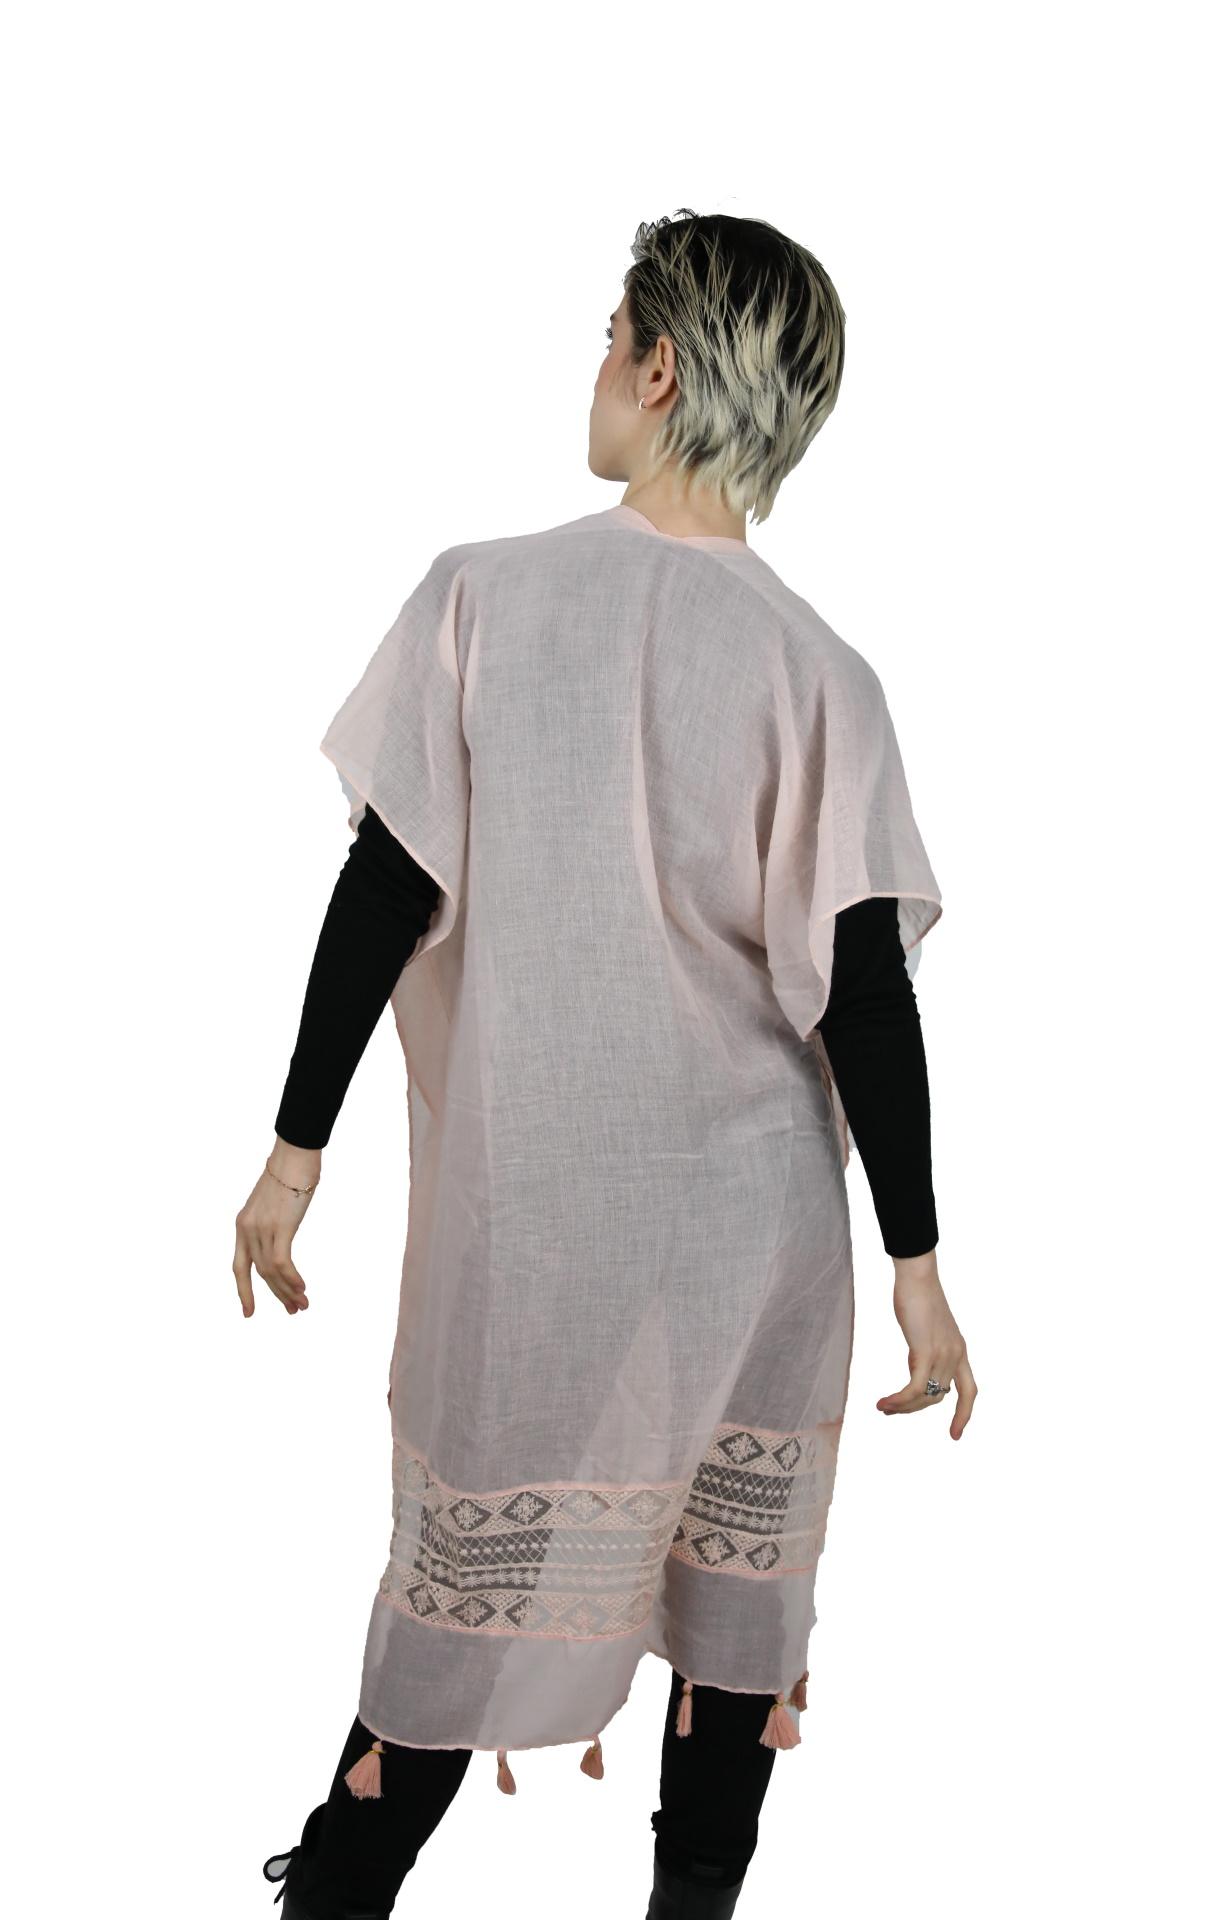 CLOTHES174 STOLA DONNA FOULARD CARDIGAN COPRISPALLE 1 1stAmerican elegante stola da donna foulard cardigan coprispalle